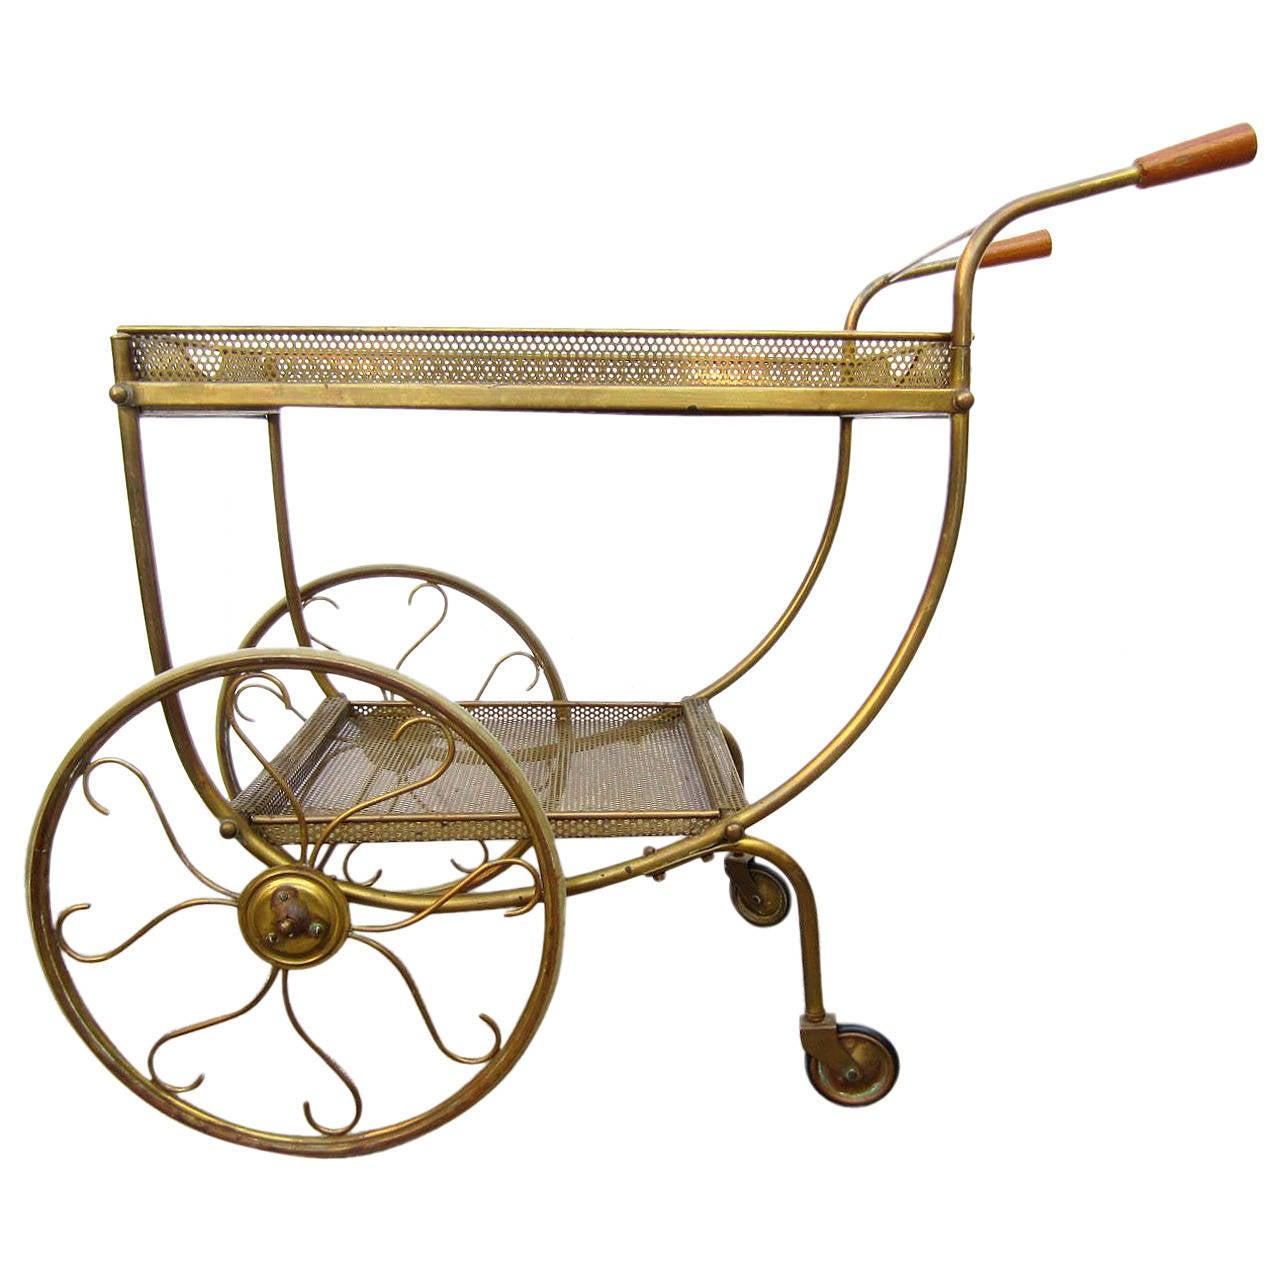 swedish mid century modern brass tea bar trolley cart by firma svensk tenn at 1stdibs. Black Bedroom Furniture Sets. Home Design Ideas